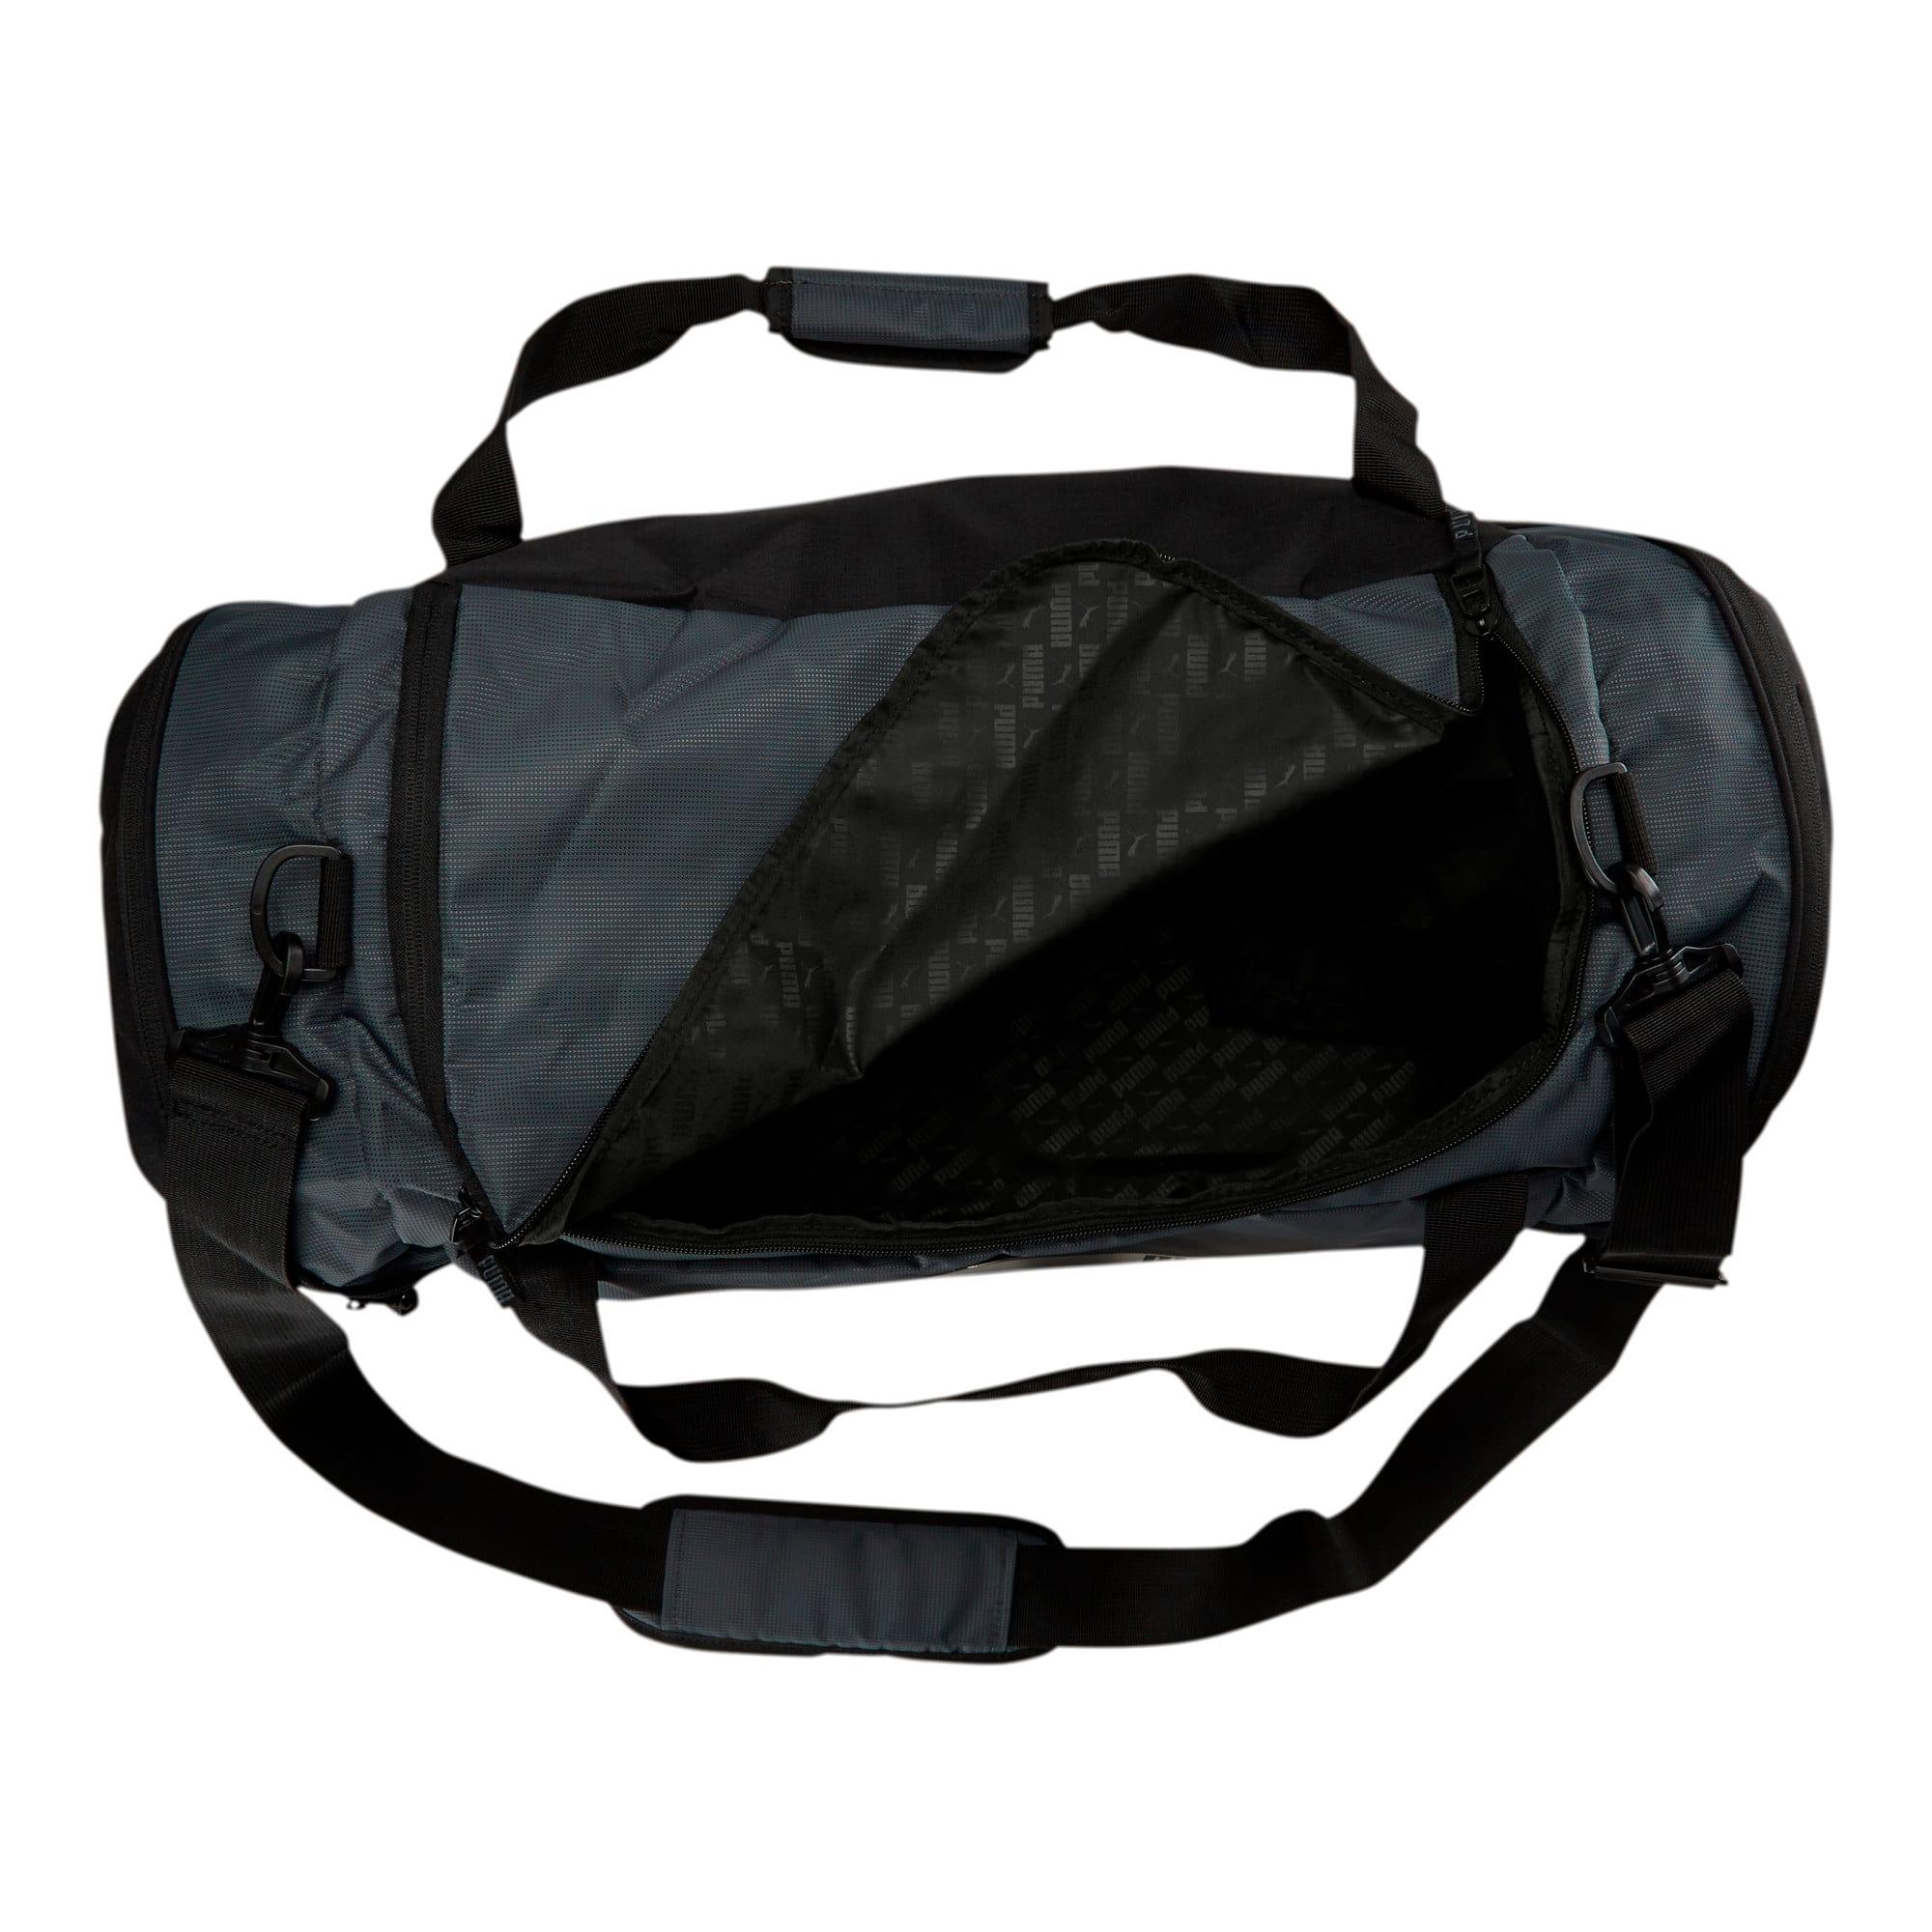 "Thumbnail 3 of Formation 2.0 24"" Duffel Bag, Grey/Black, medium"